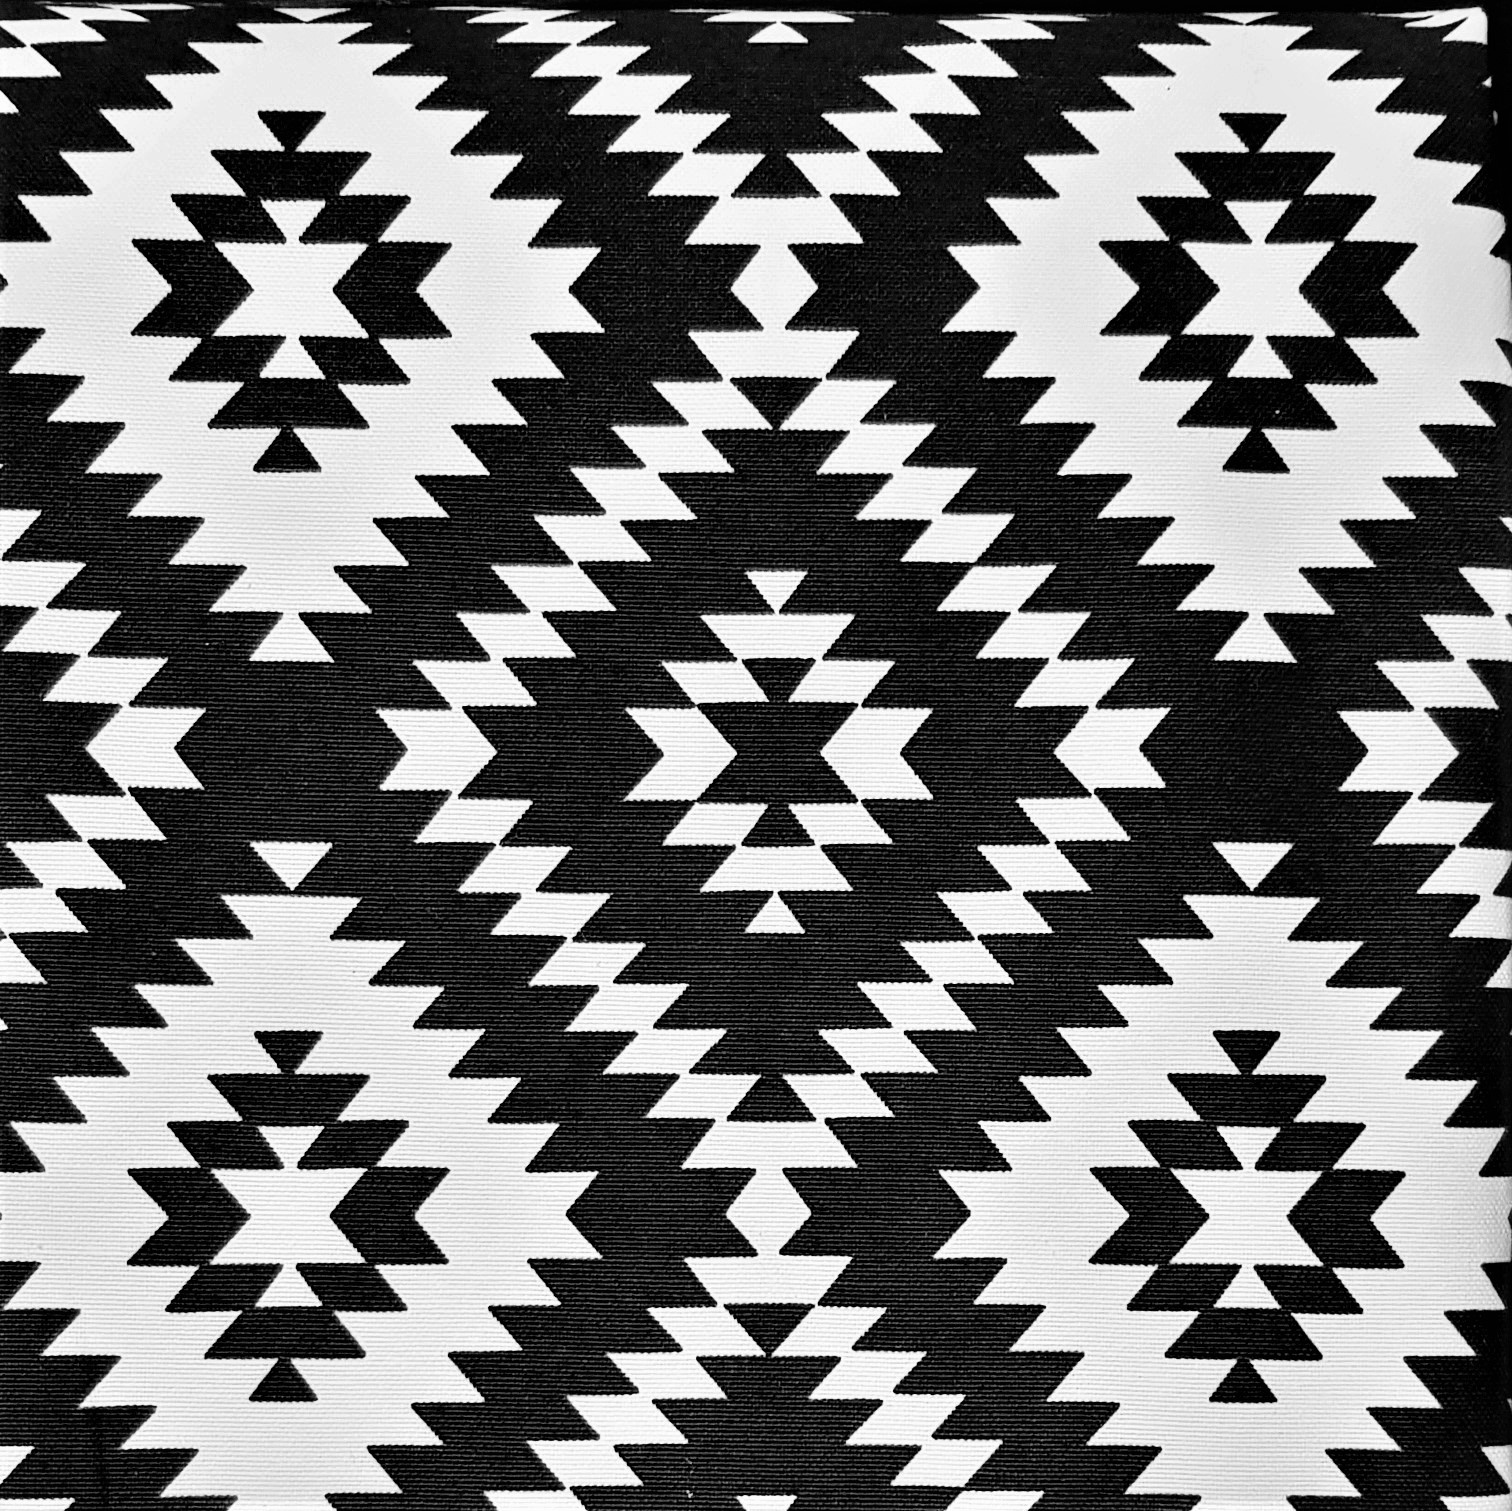 Mantel ÉTNICO NEGRO Rectangular 1,5x2,1 m [enstockpara envíooretiro]